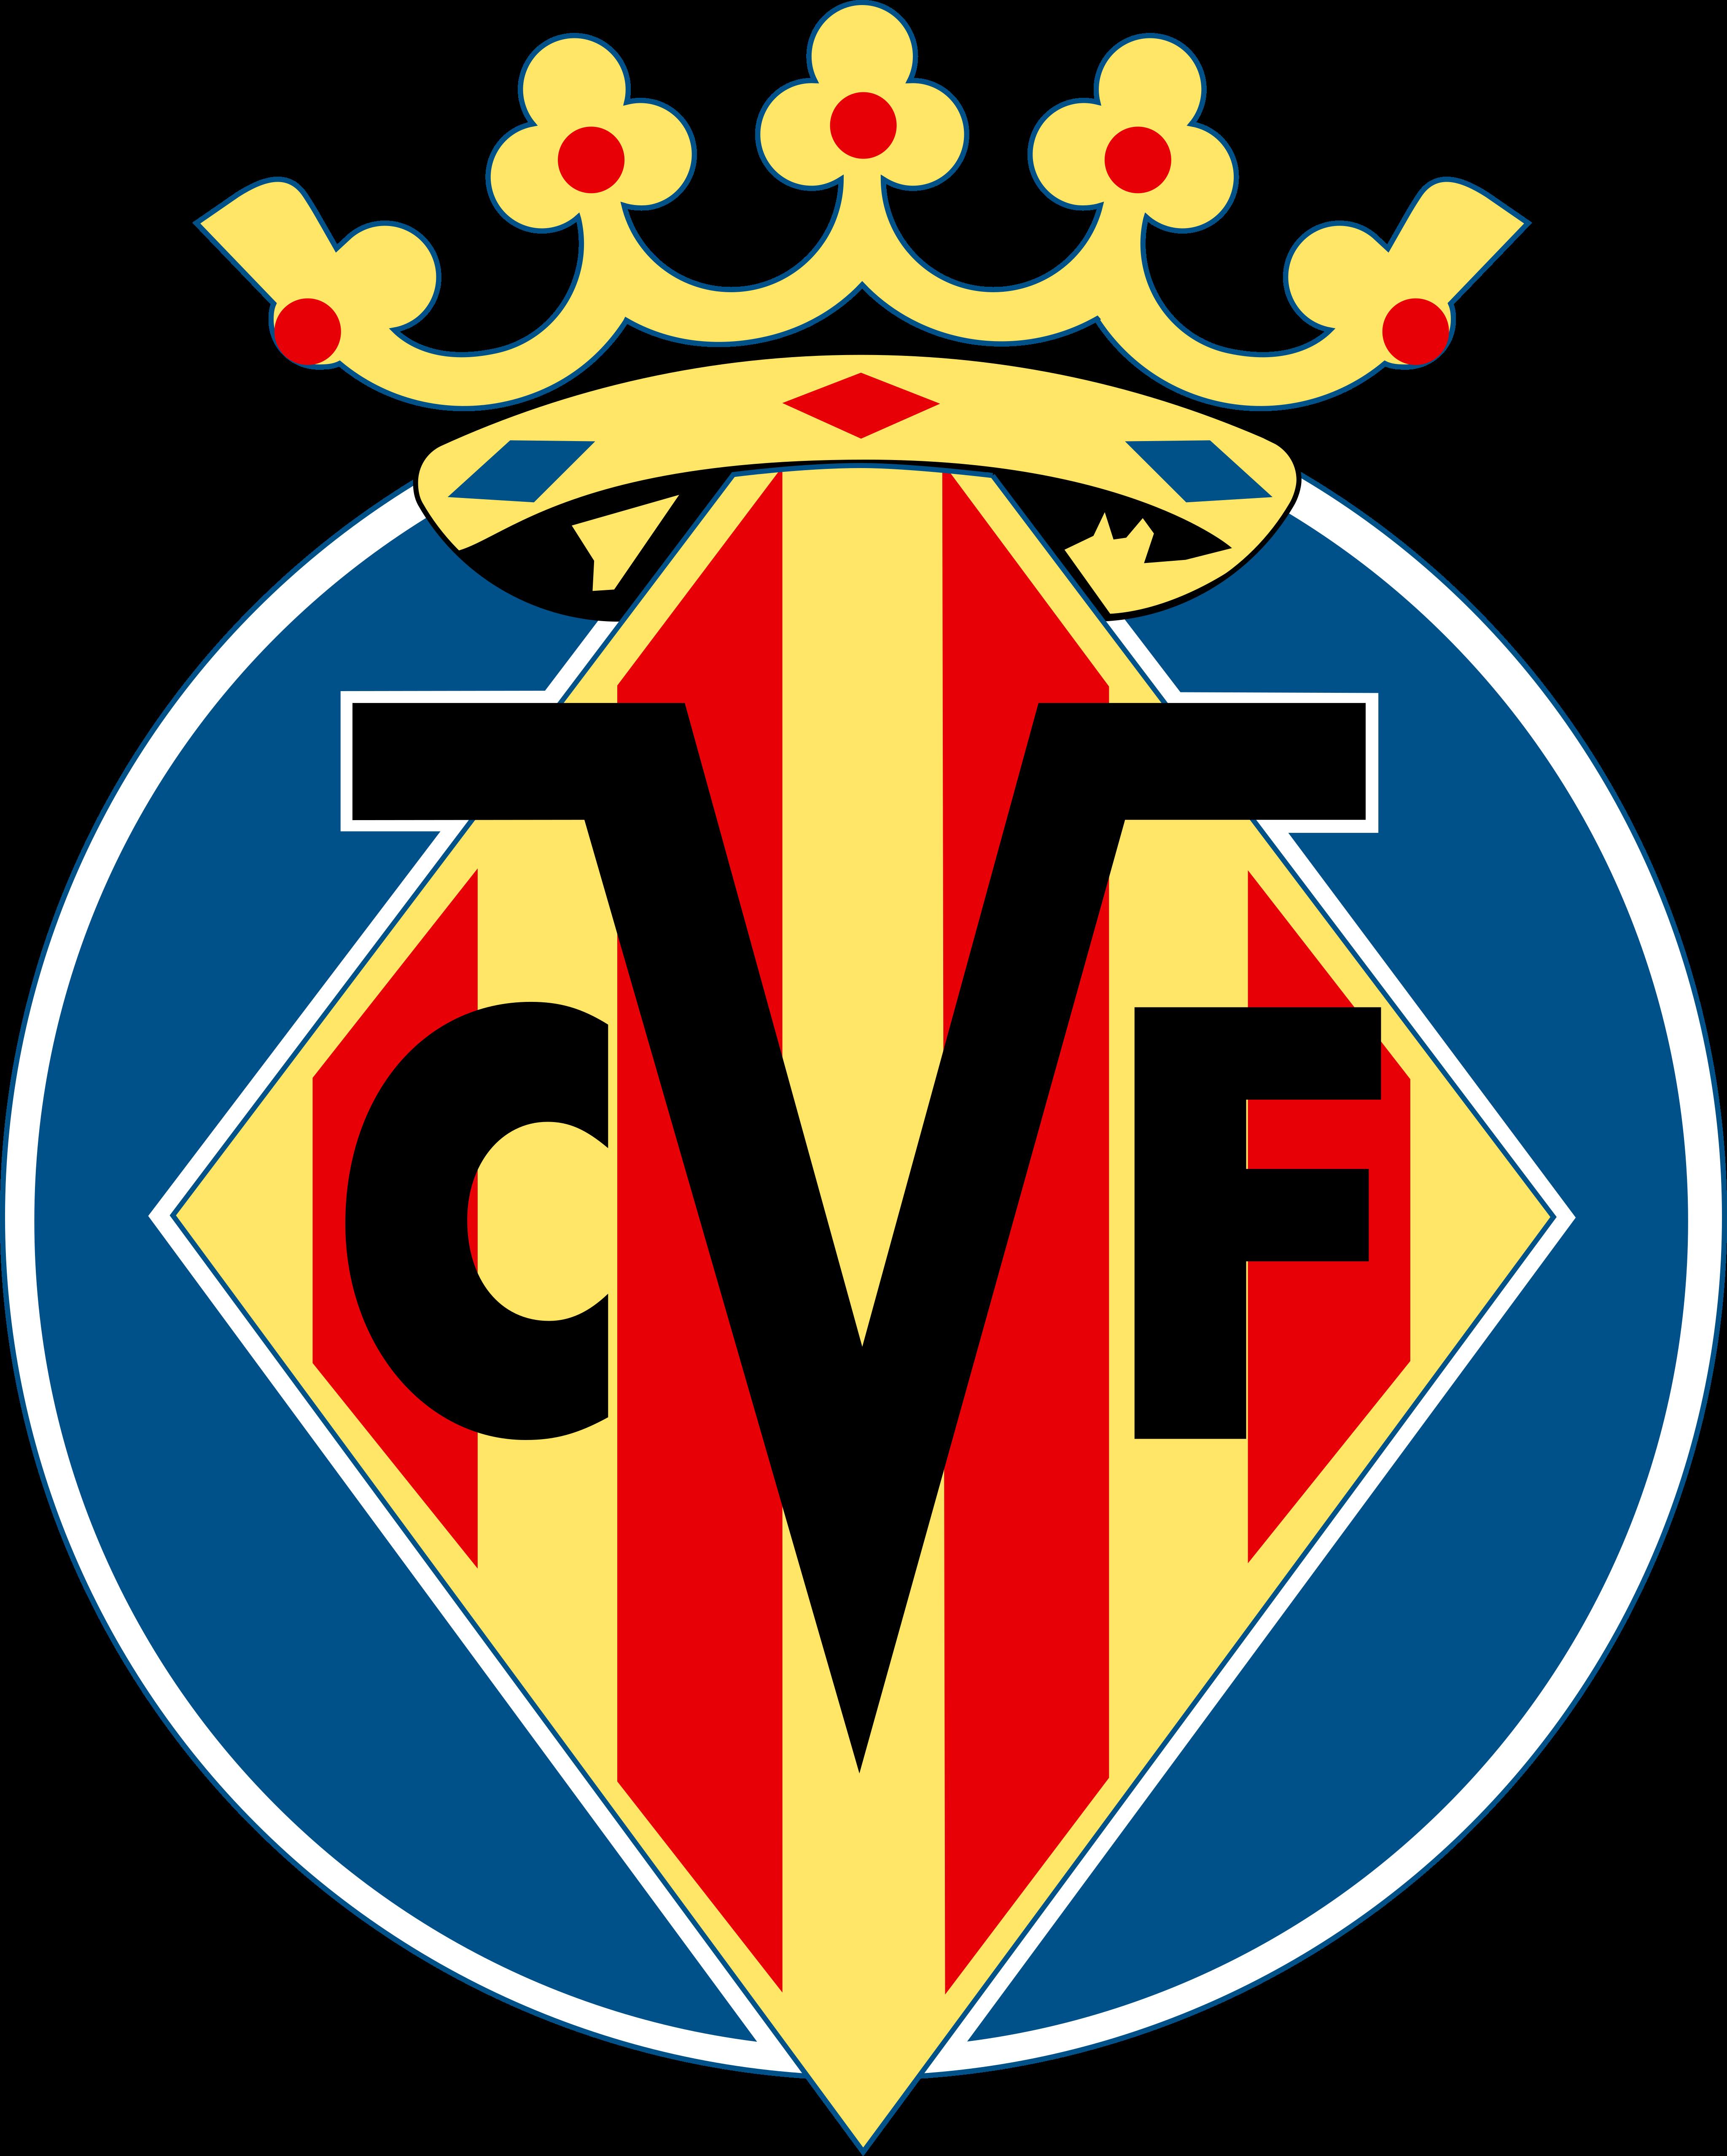 villarreal cf logo - Villarreal CF Logo